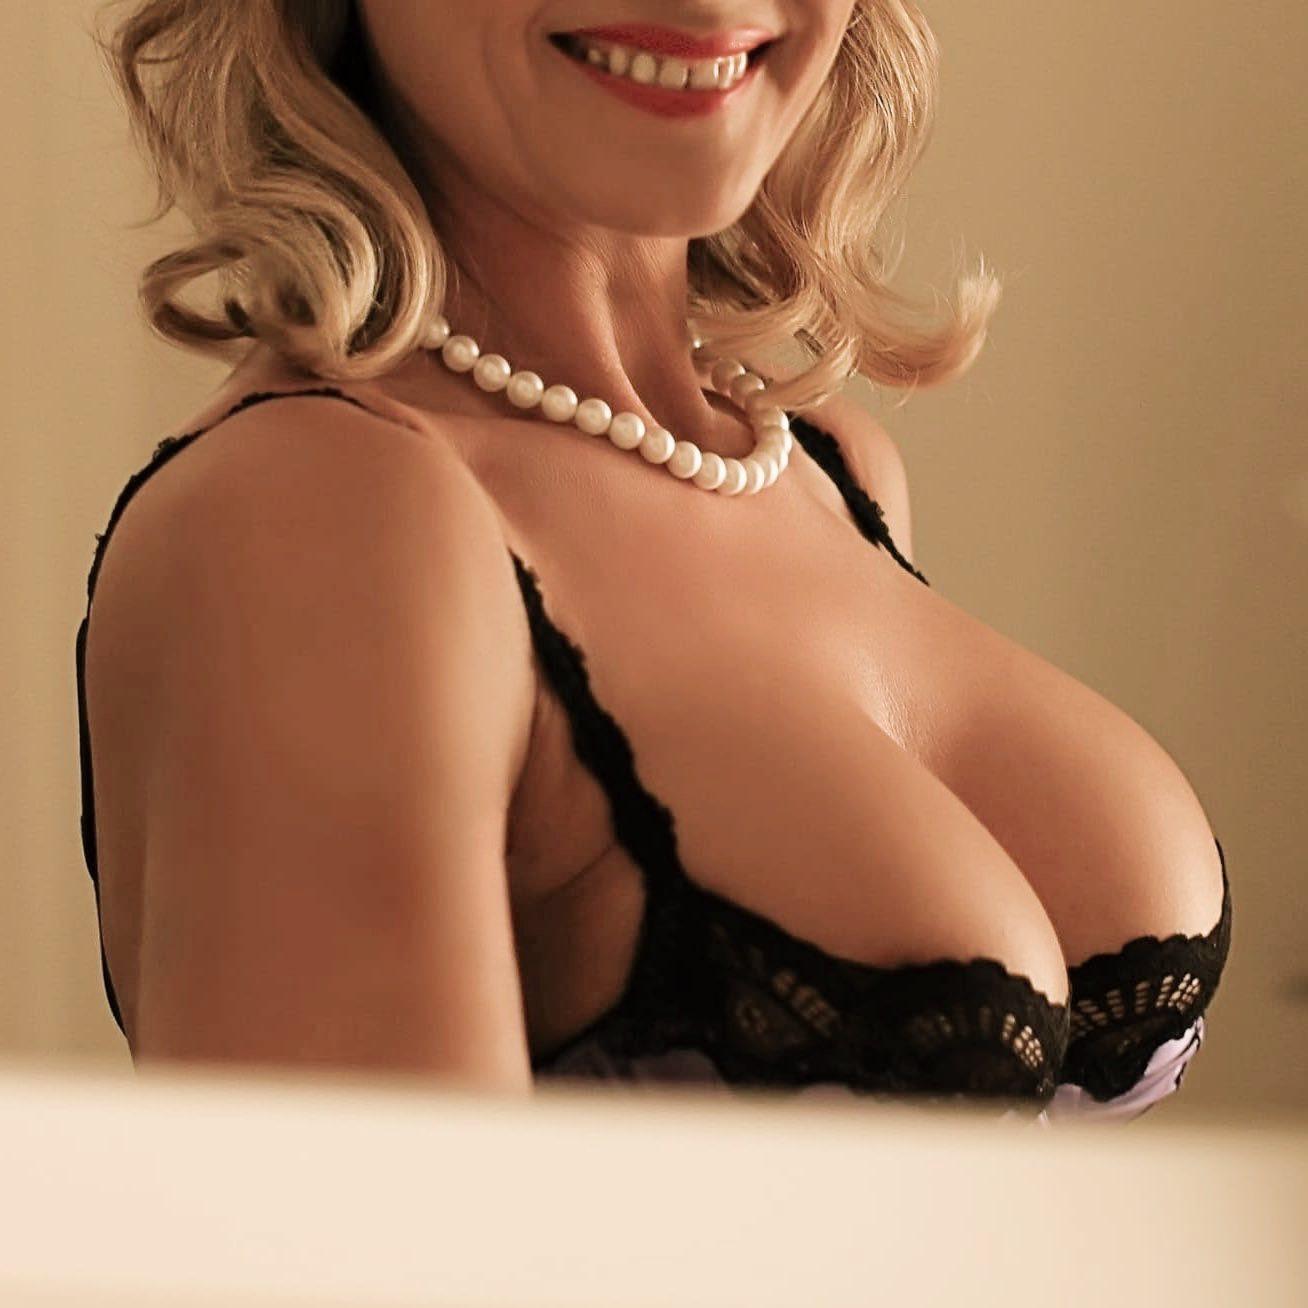 lady-valerie-aus-karlsruhe-perfect-date-escort-001 2rd.jpg